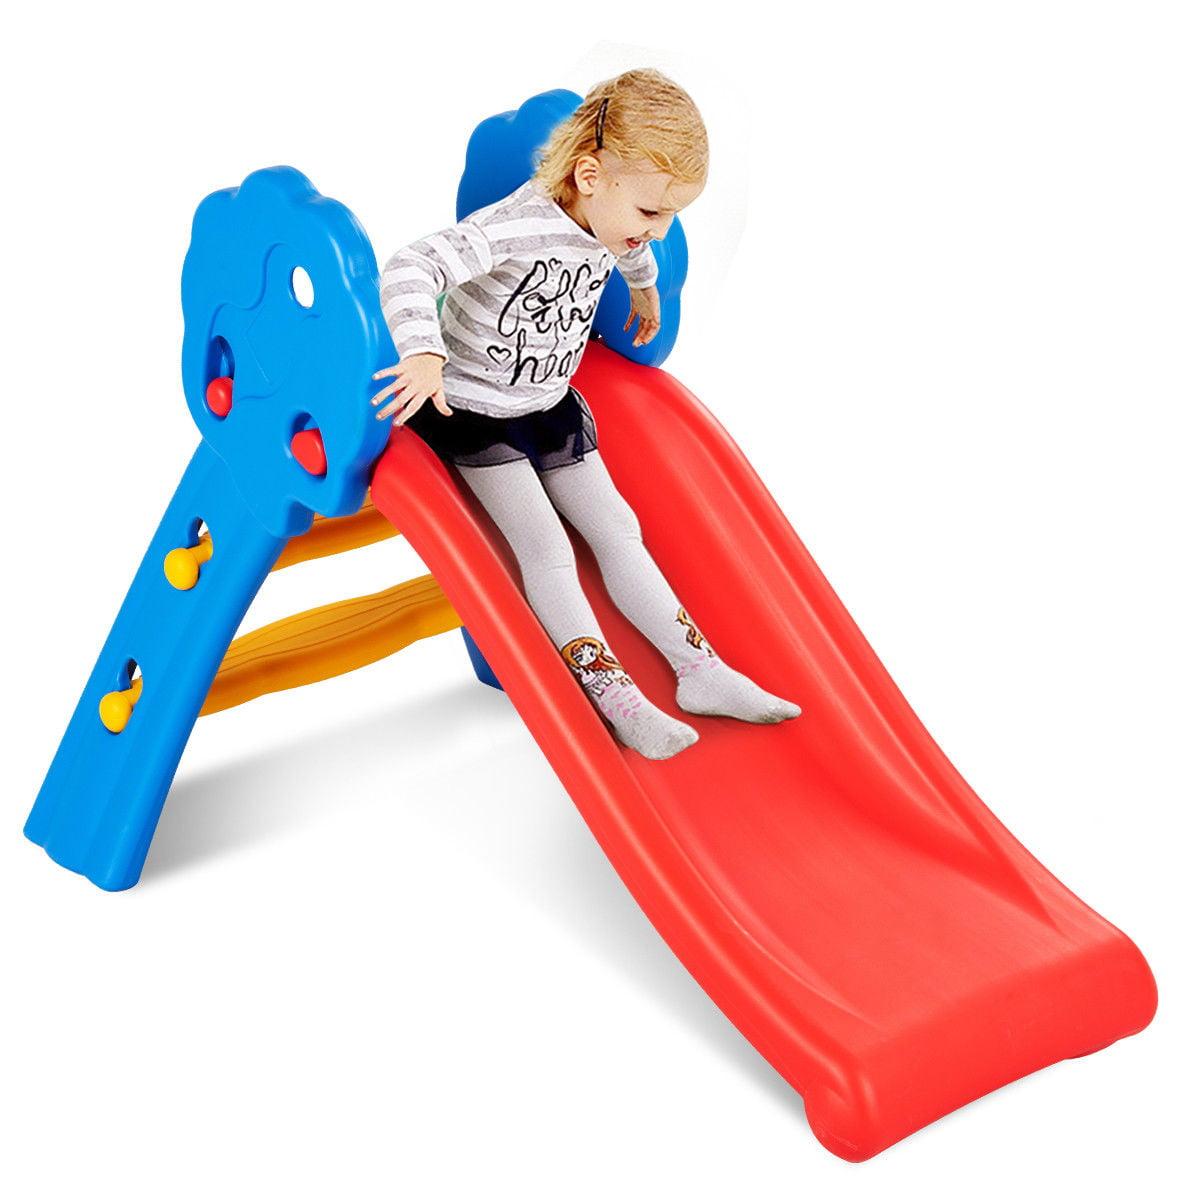 Children Slides And Climbers Slide Kids Play Slide Toddler Indoor Outdoor Toys